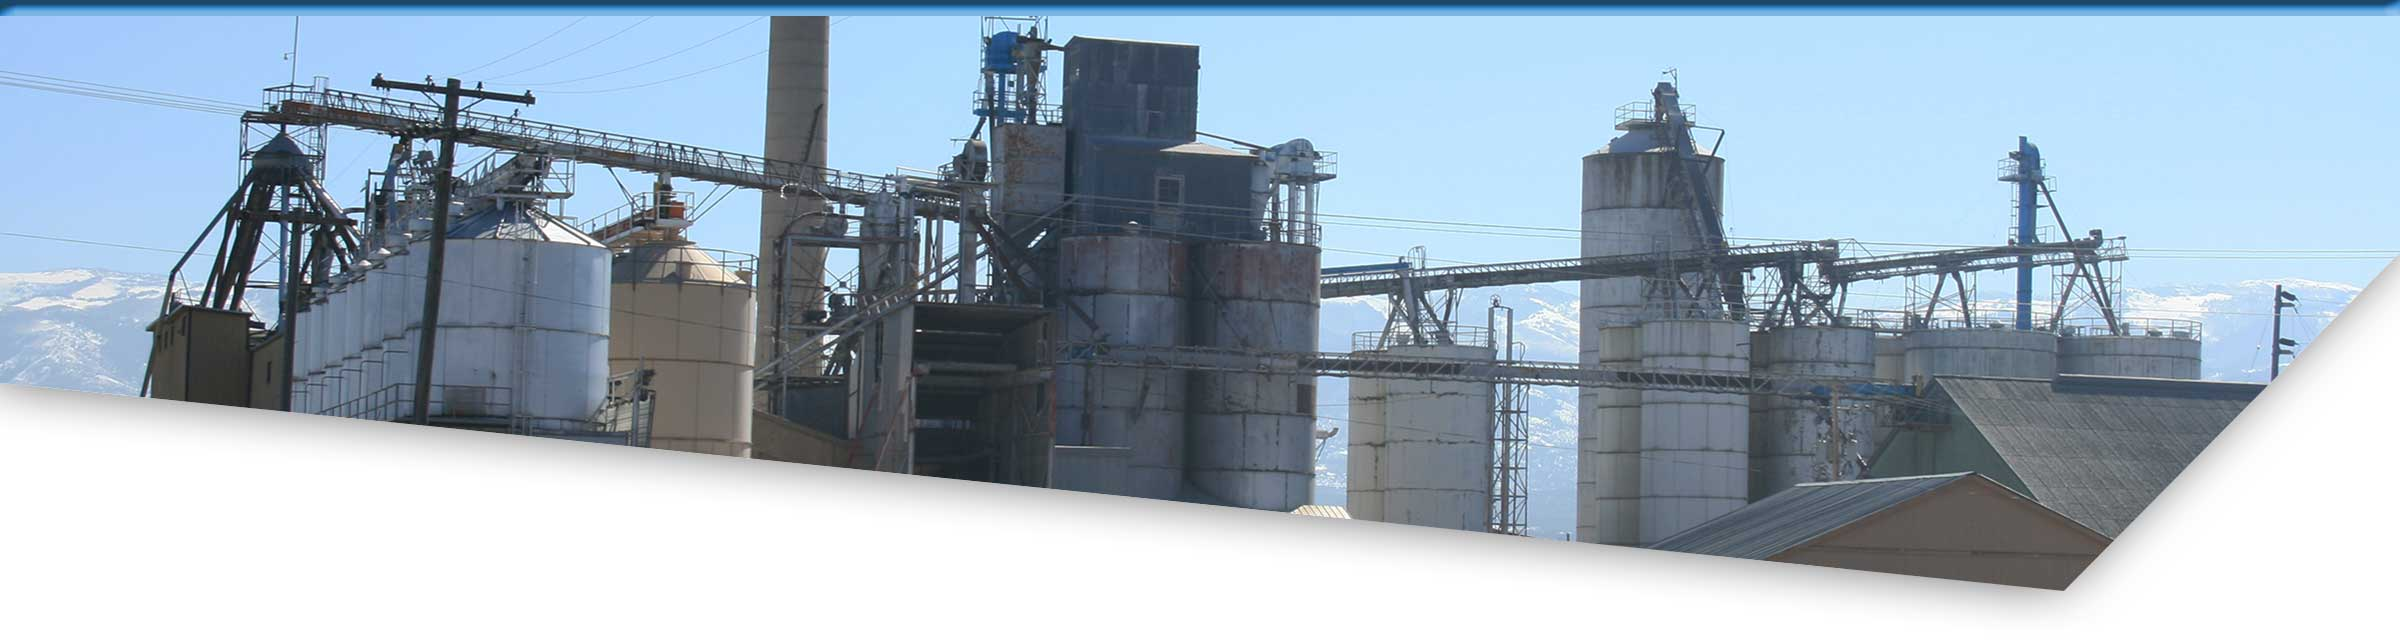 Moroni Feed Company plant